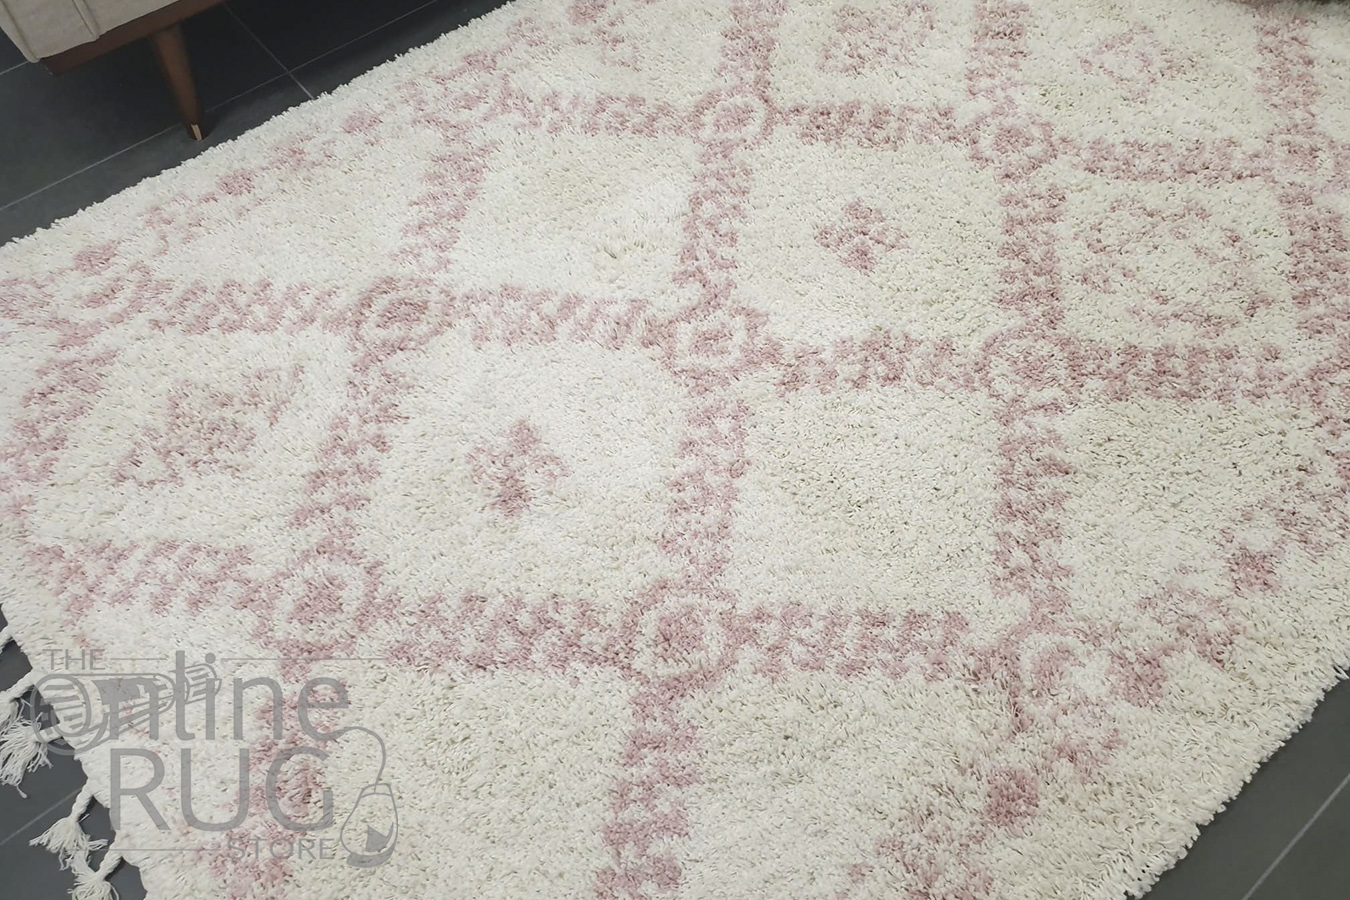 Saffia Pink Ethnic Prints Plush Boho Rug